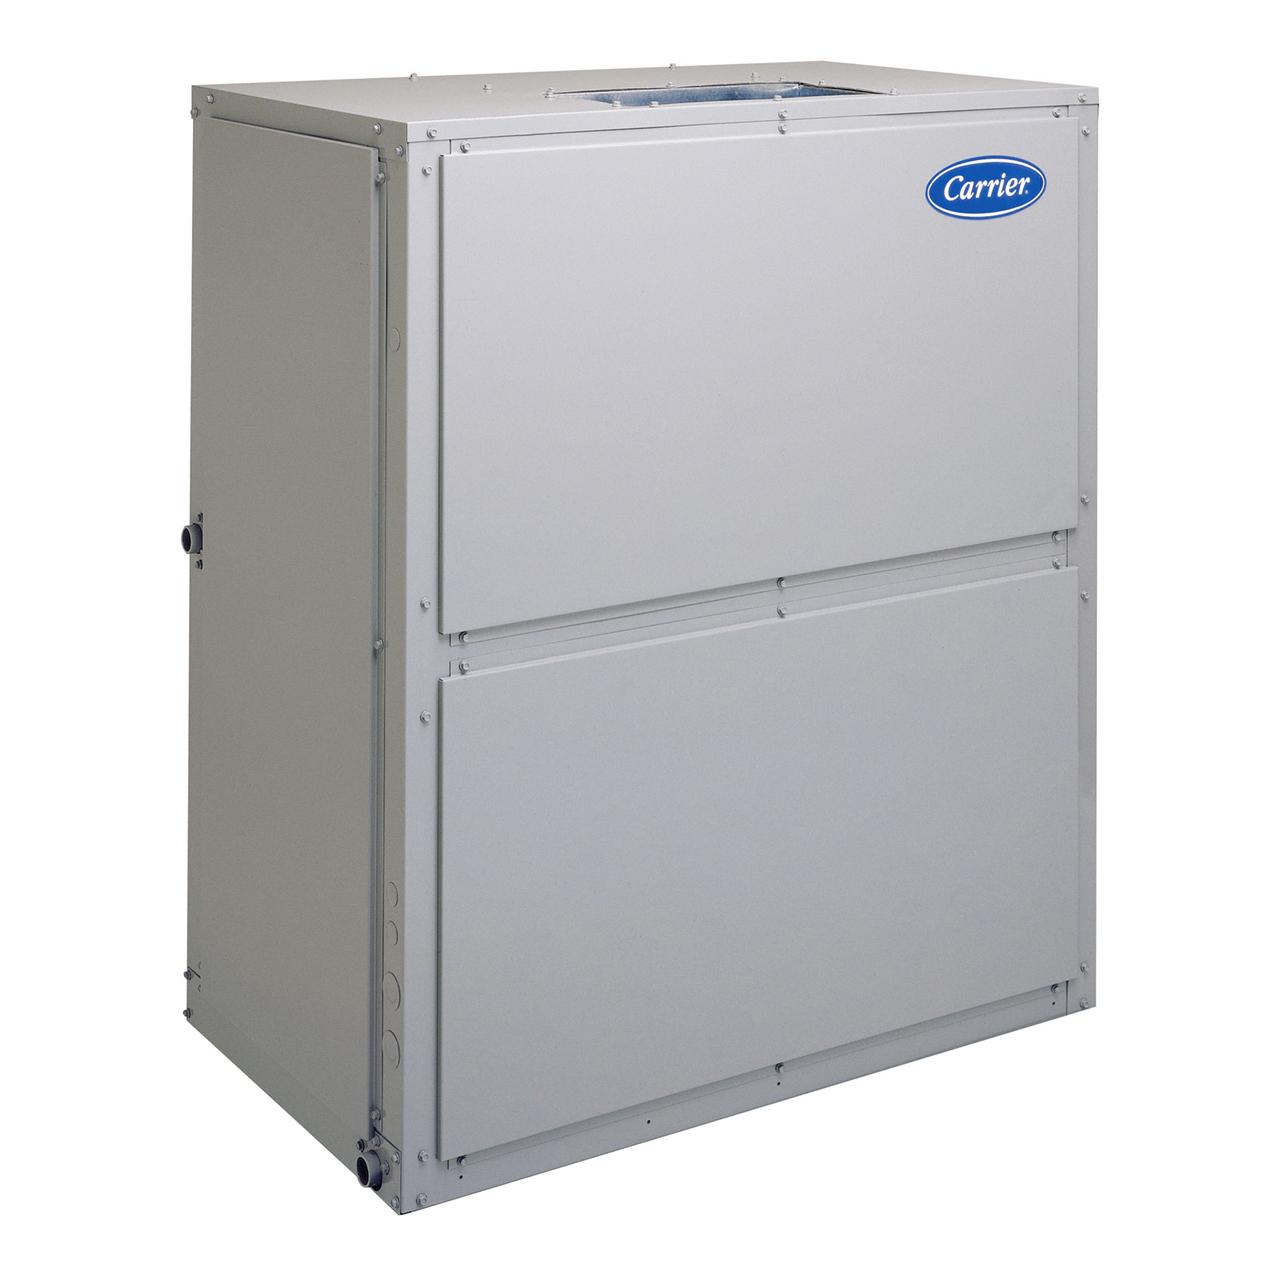 carrier-40ruq-packaged-air-handling-unit-heat-pump